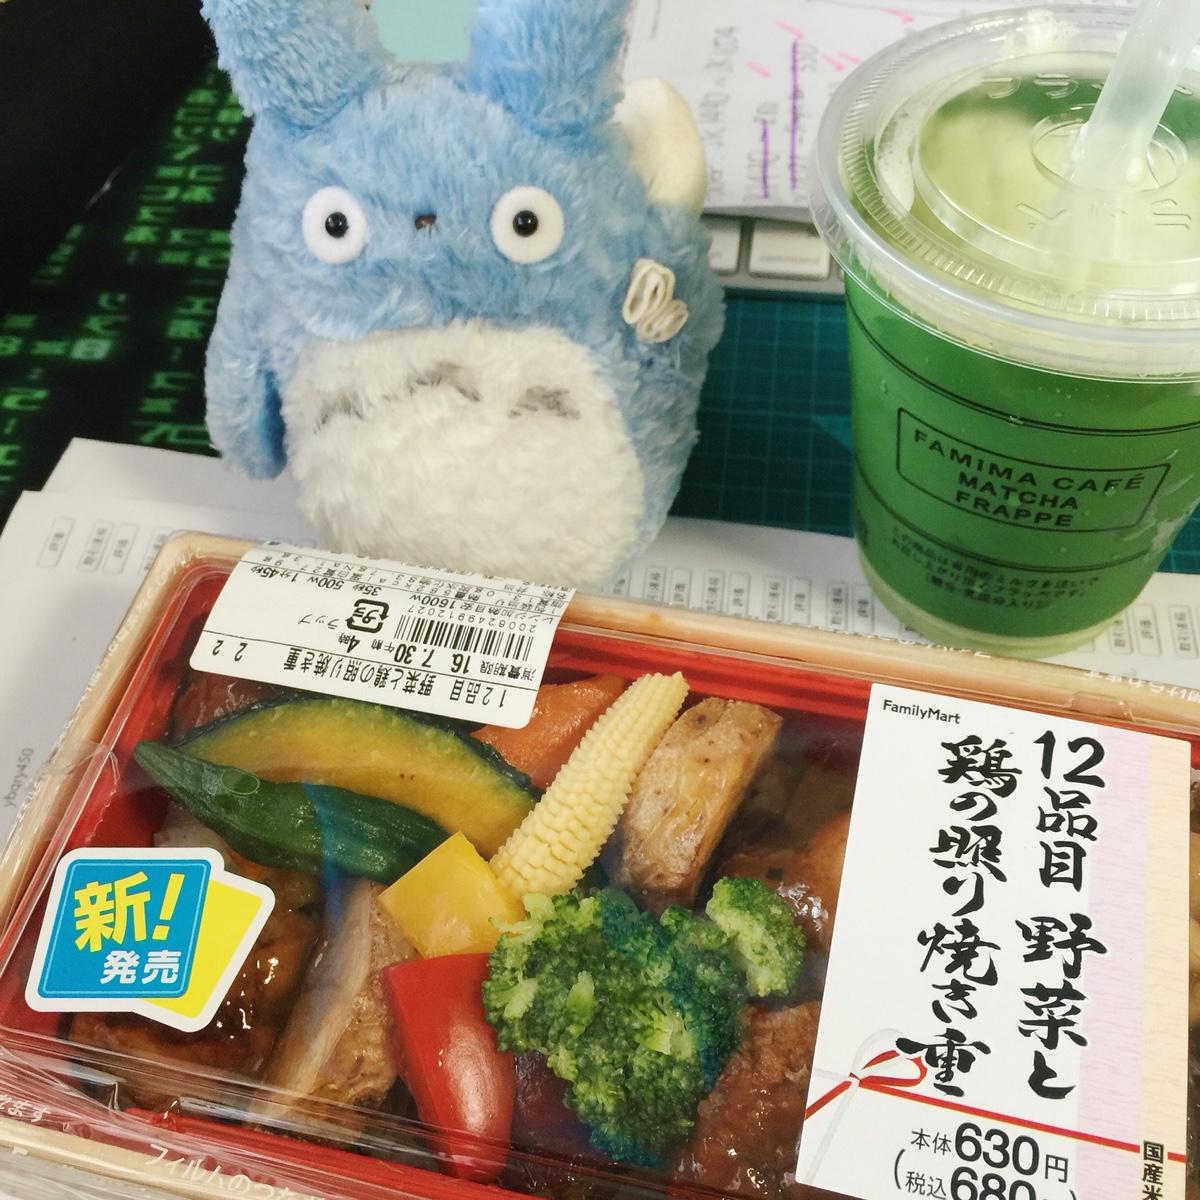 bento-lunch-box-totoro.jpg